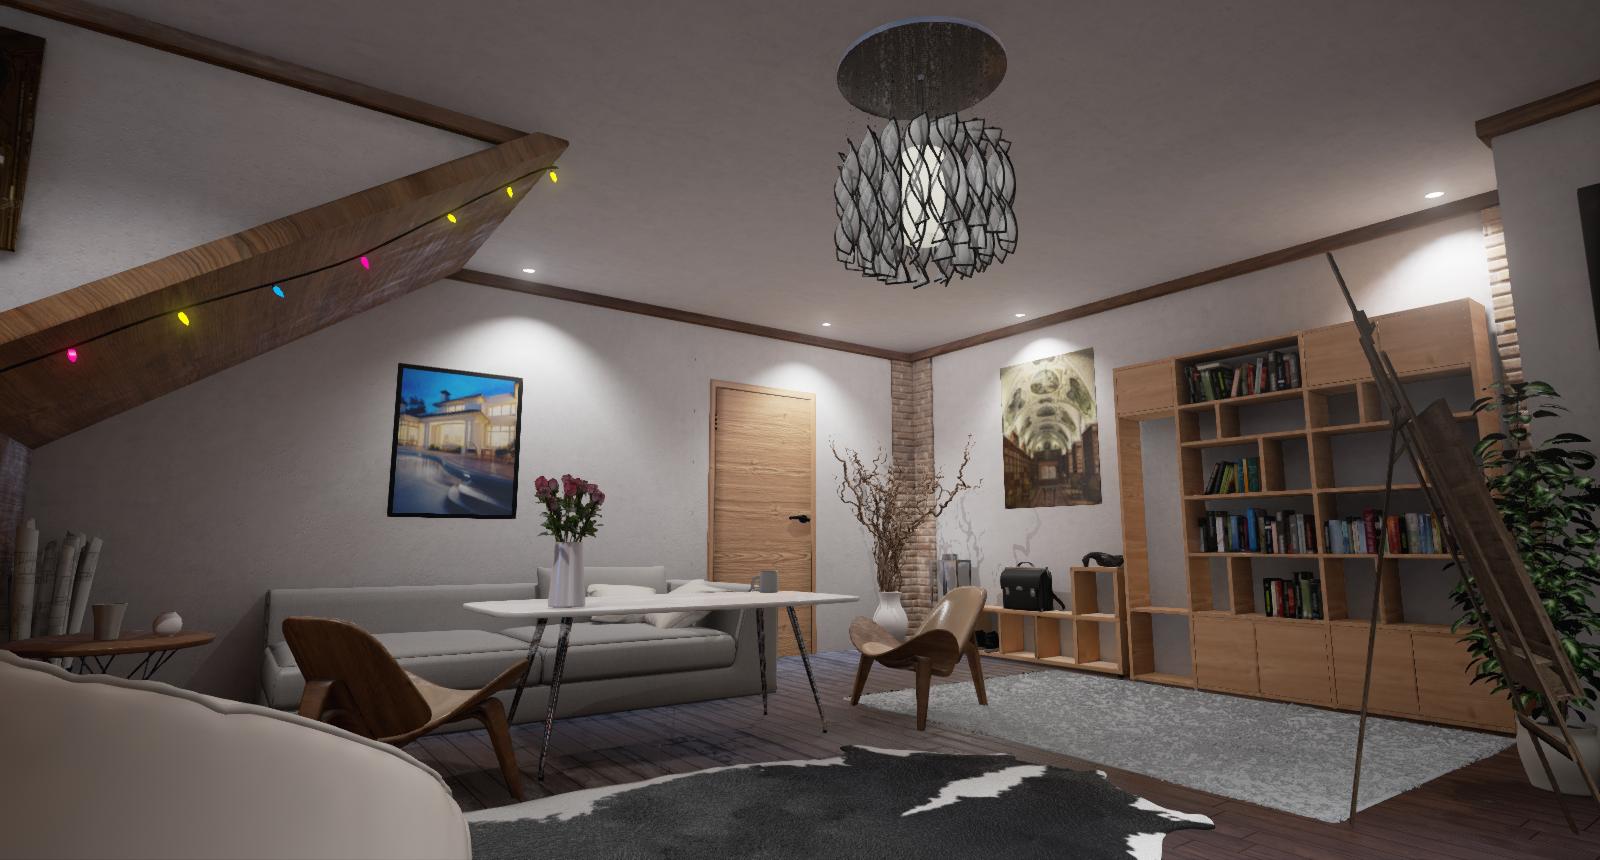 Interior Design In Unreal Engine 4 3D Model